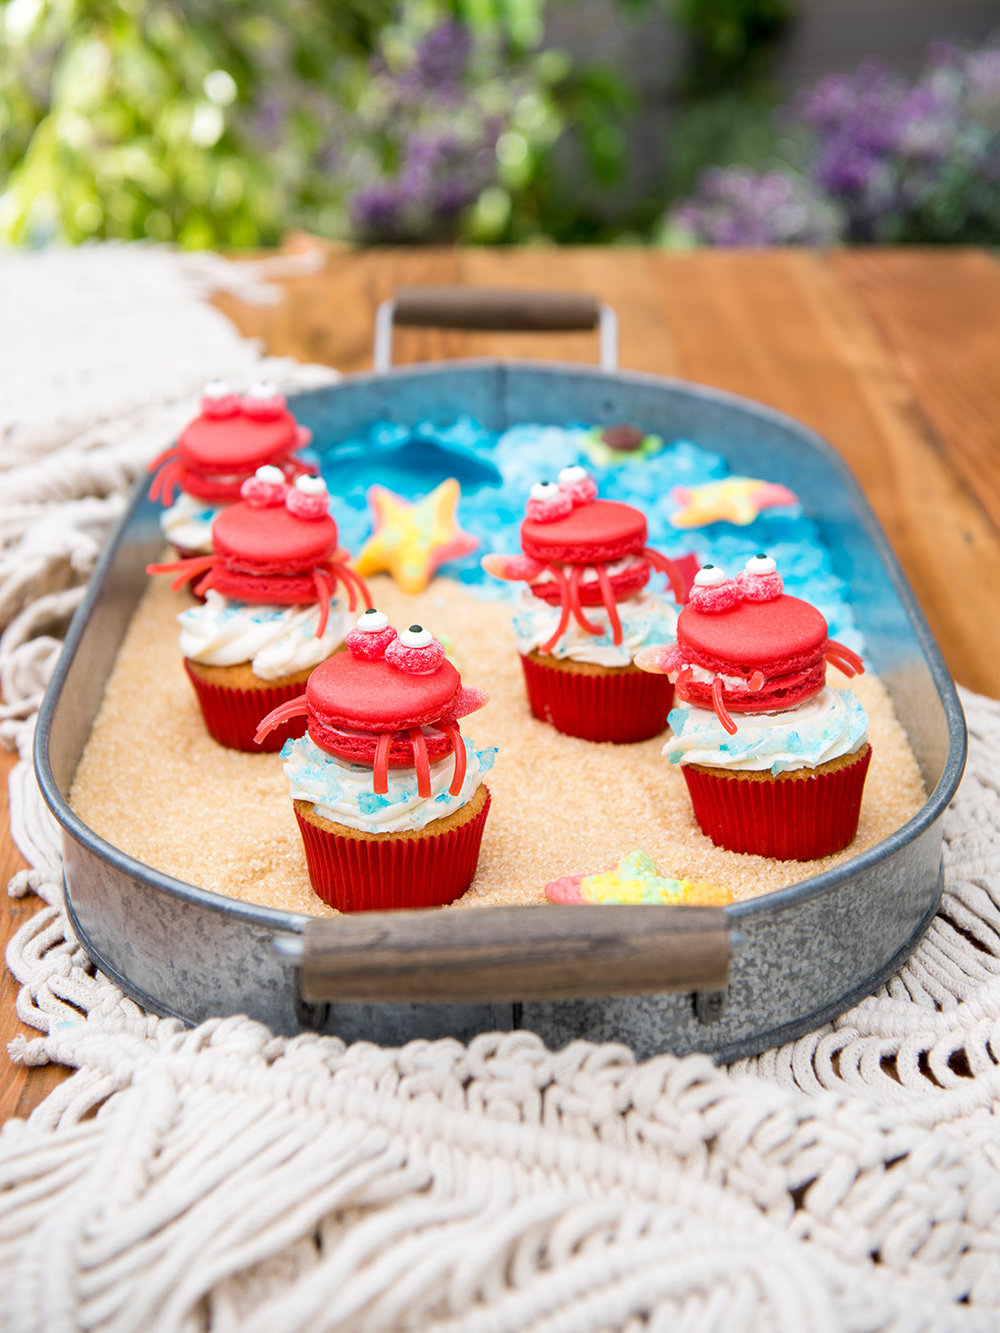 Deborah_Farnault_Food_Network_How-To-Win-Summer-Crab-Cupcakes-3x4-0597.jpg